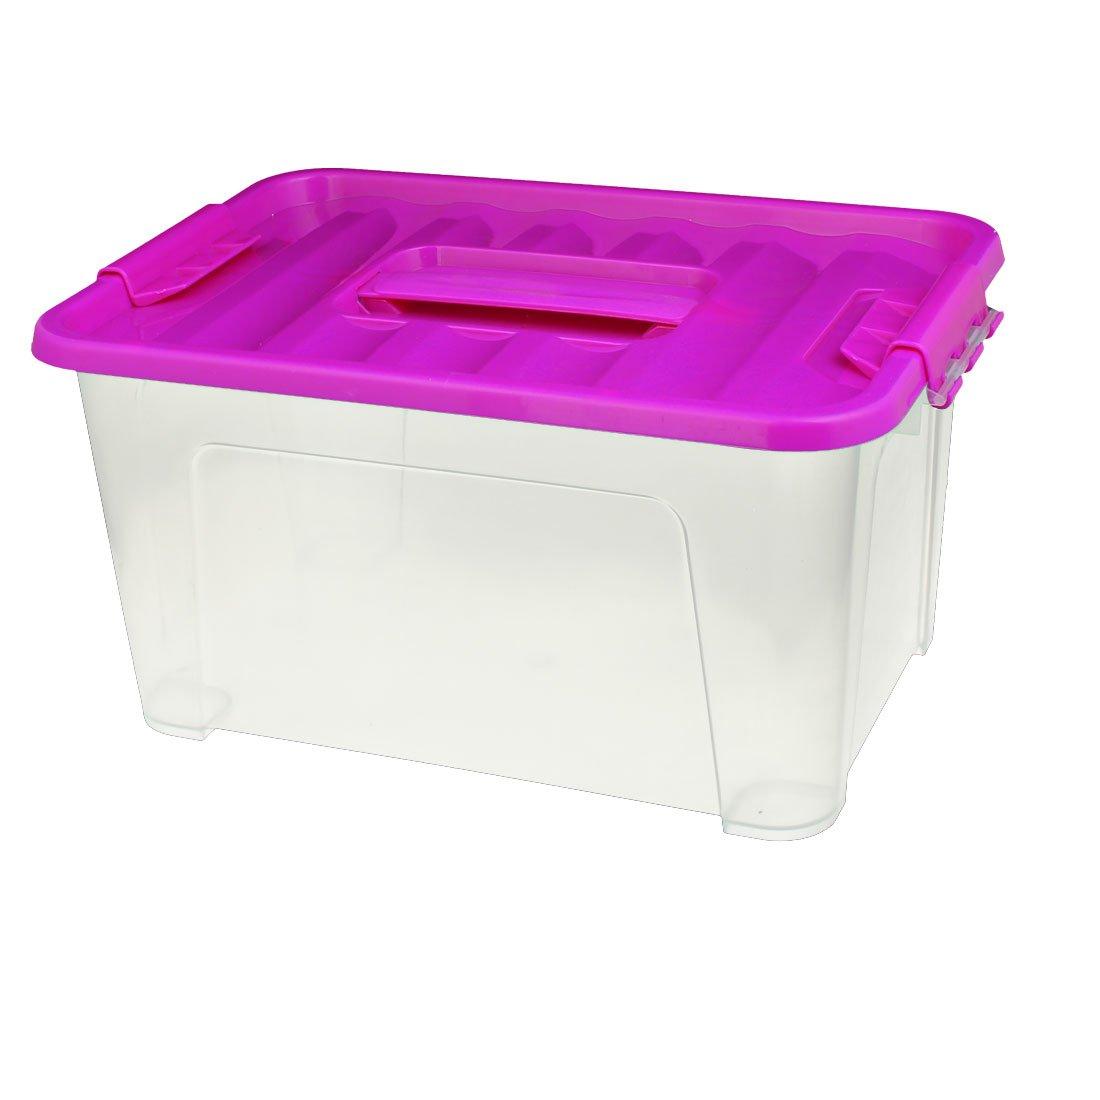 uxcell 32cm x 23cm x 16cm Plastic Purple Cap Latching Handle Box